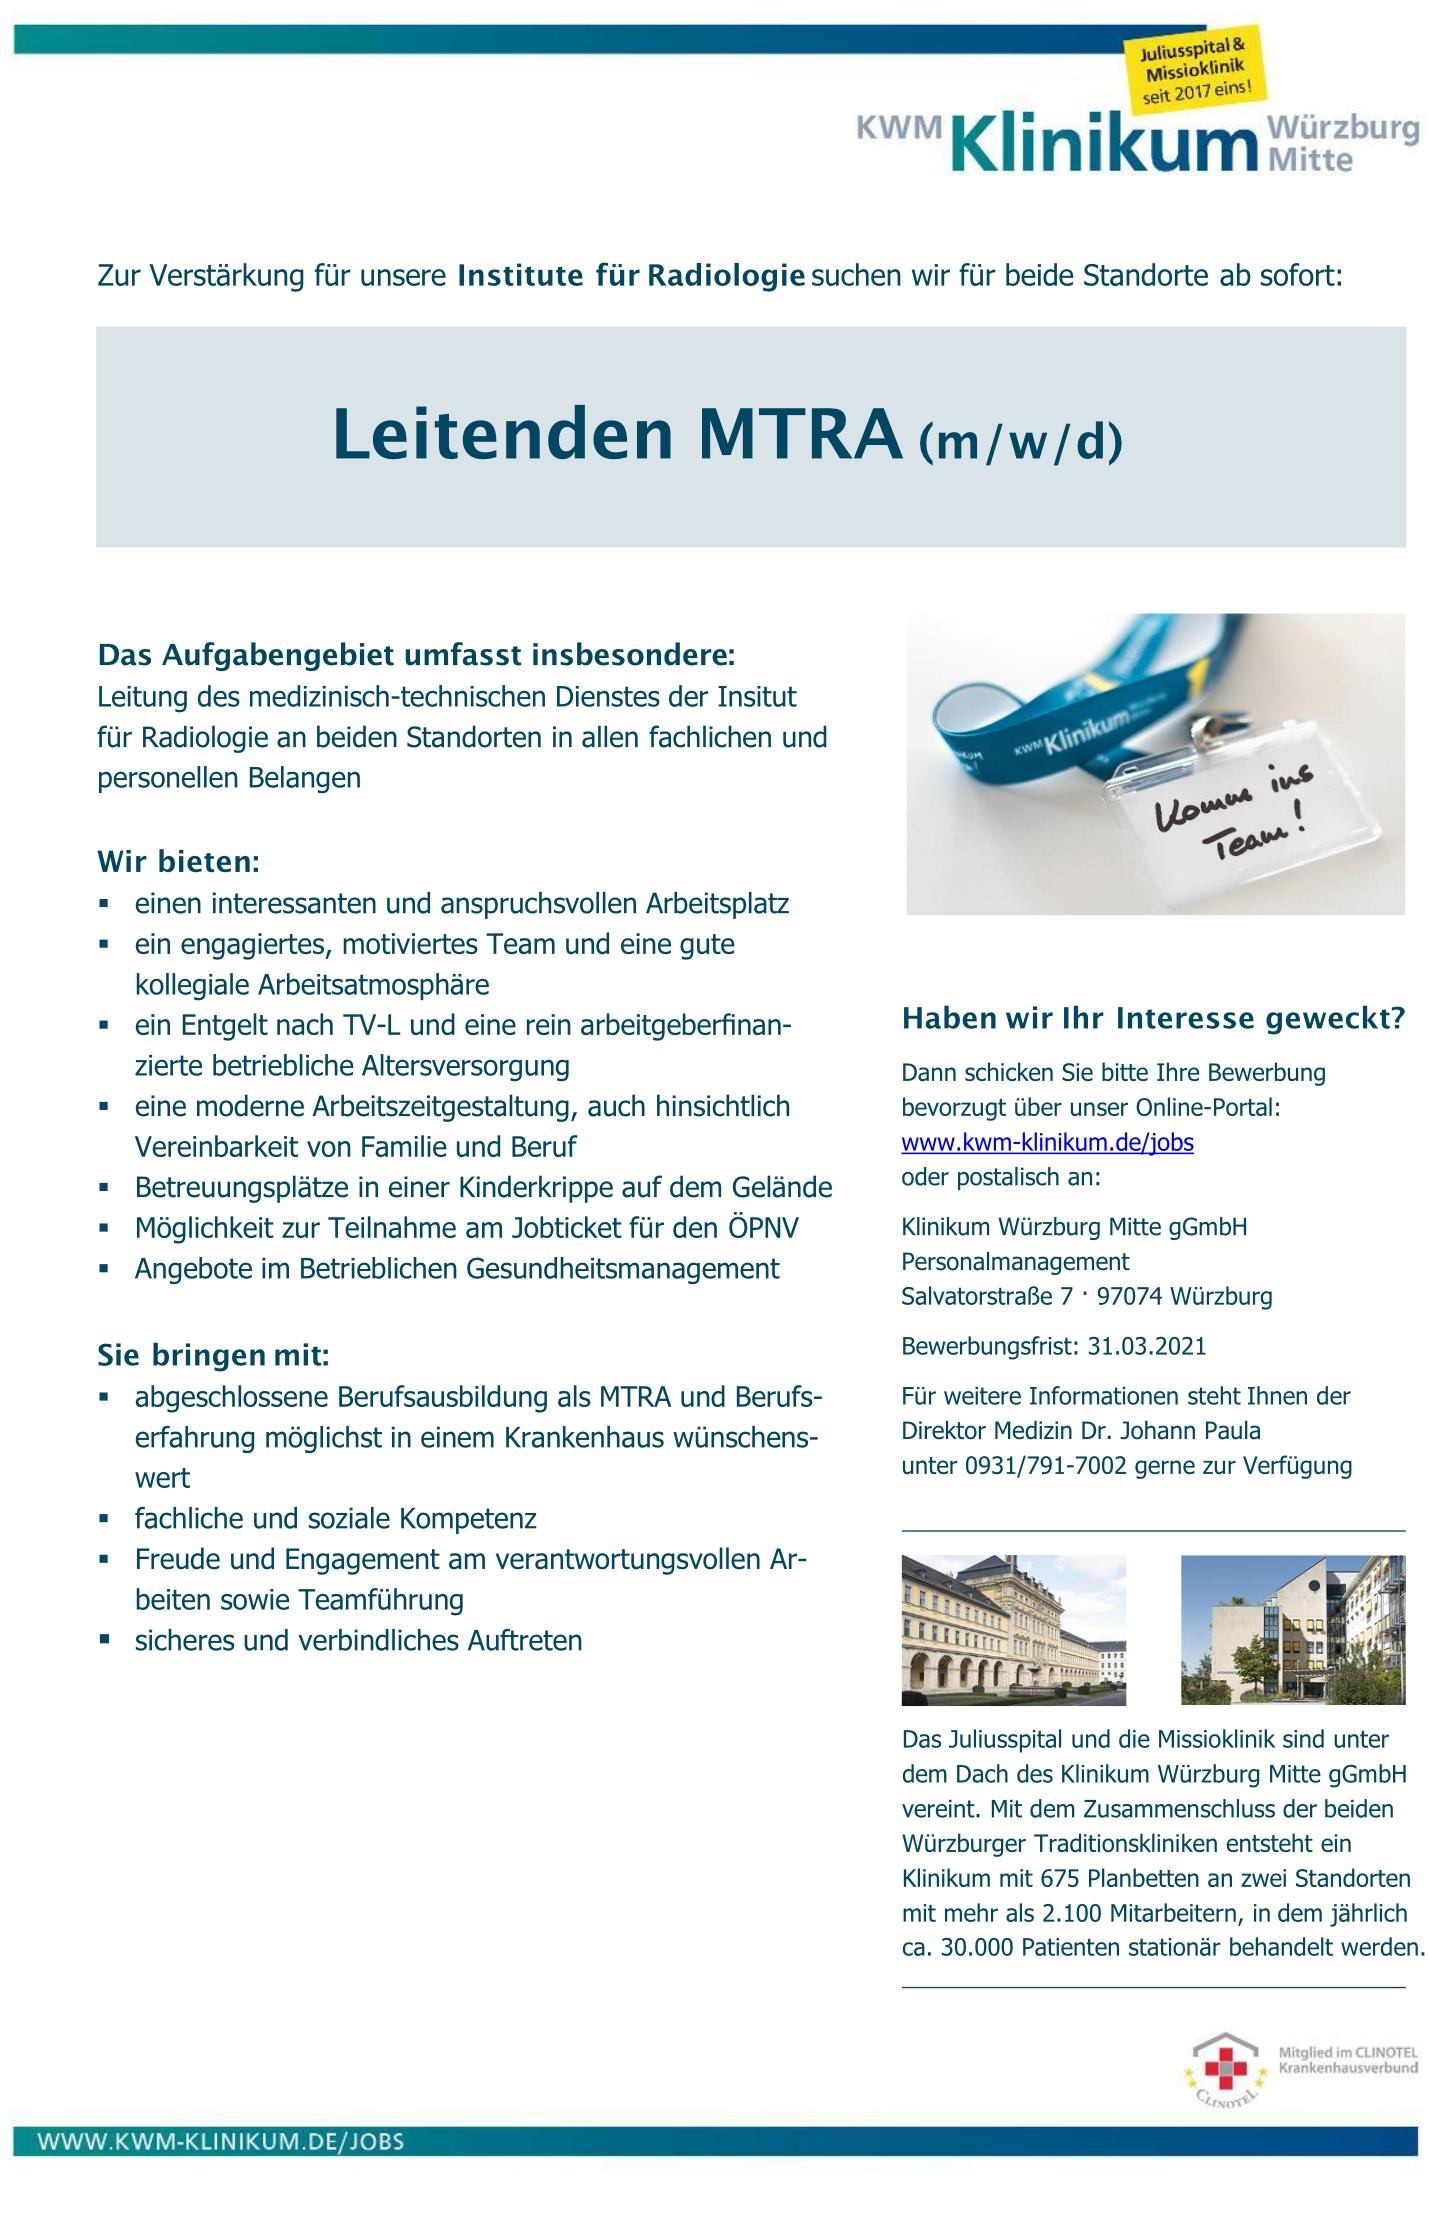 Leitender MTRA (m/w/d)